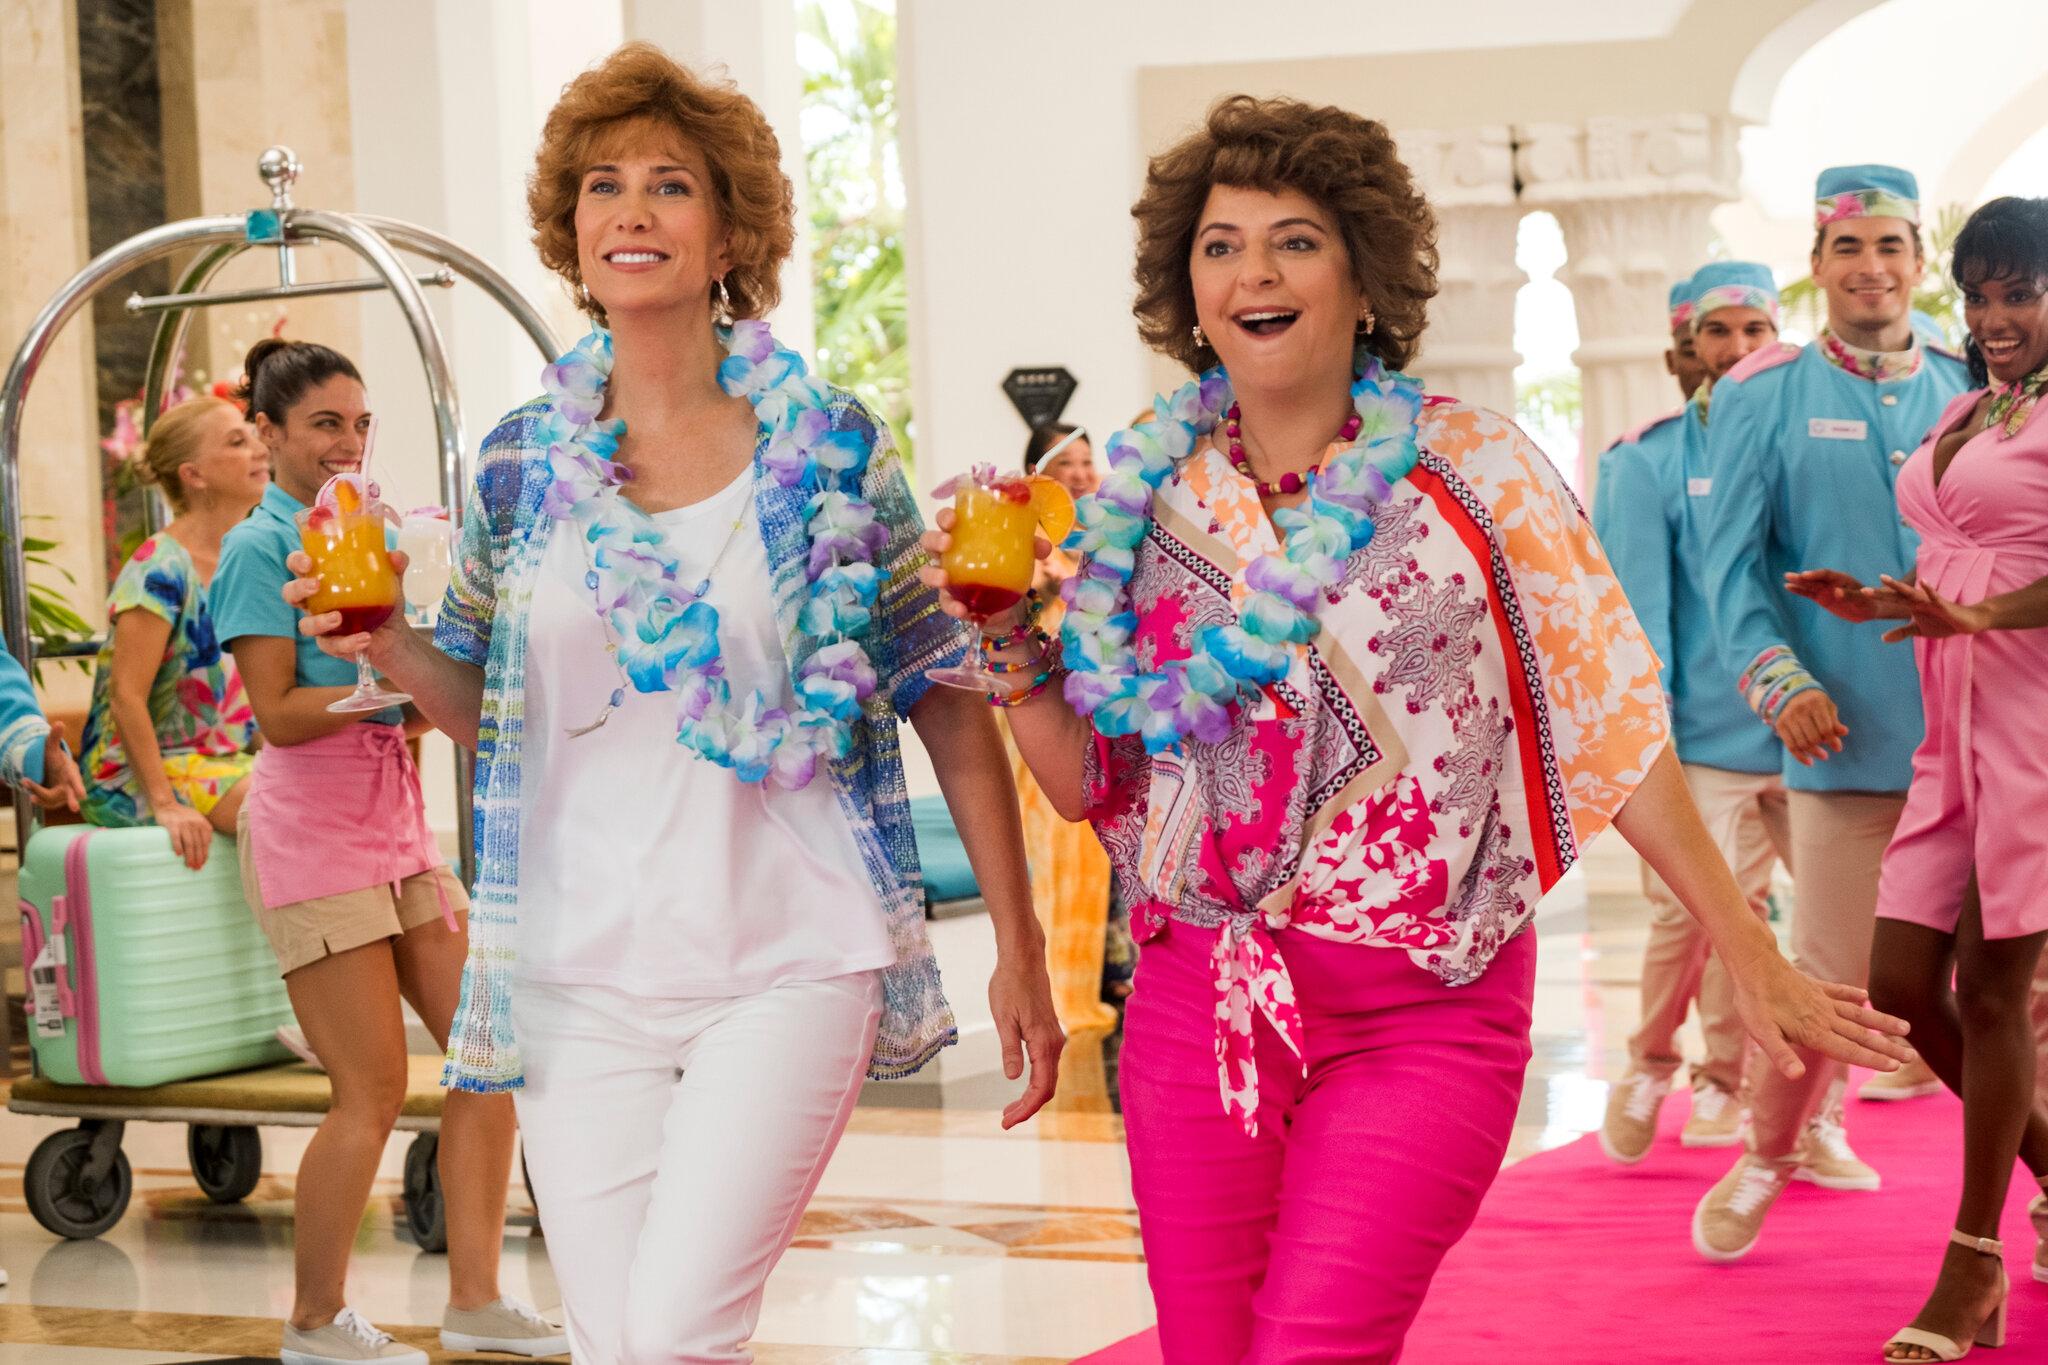 """Barb & Star اذهب إلى Vista Del Mar"""